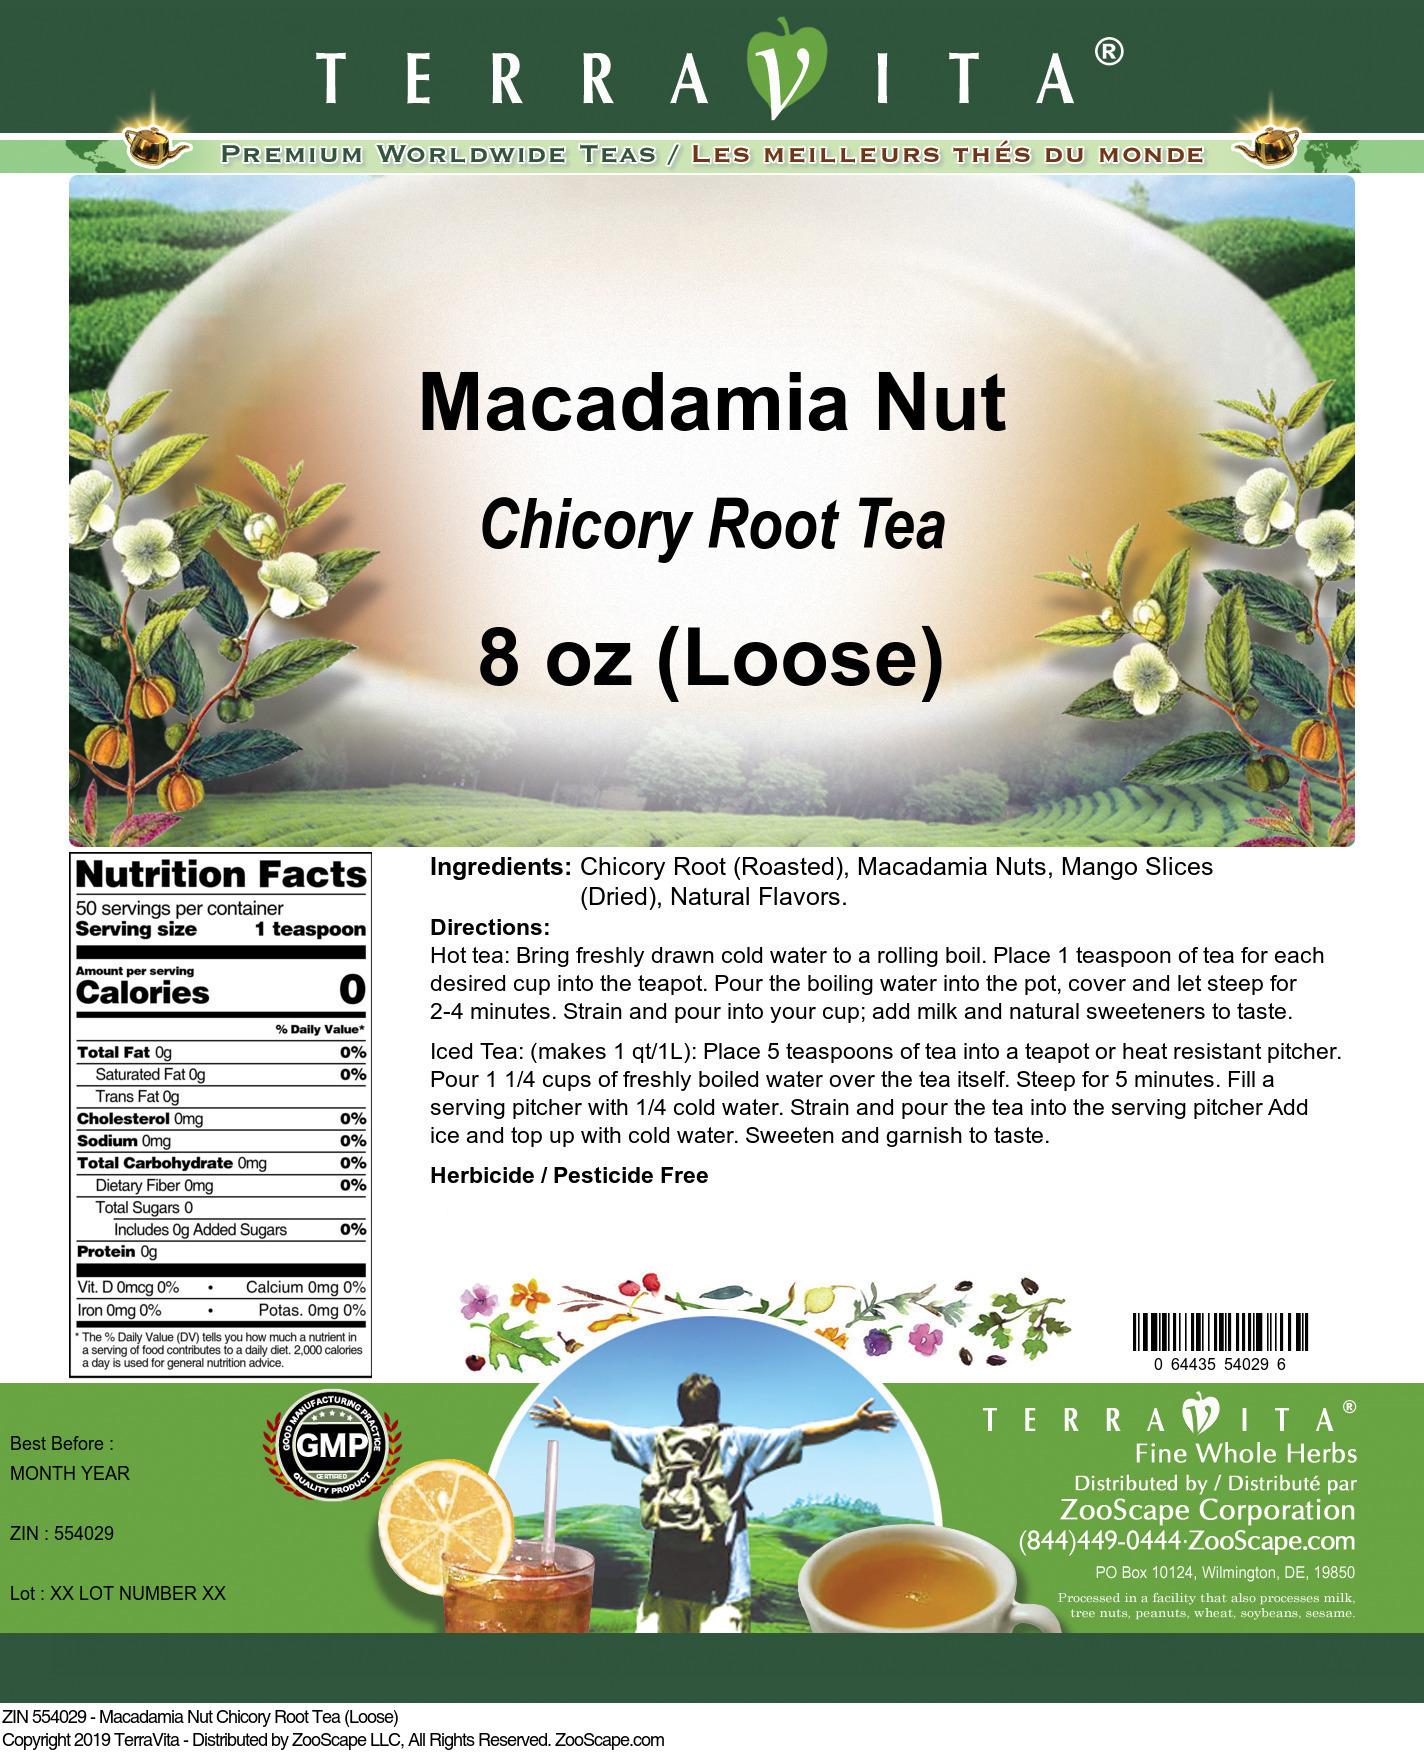 Macadamia Nut Chicory Root